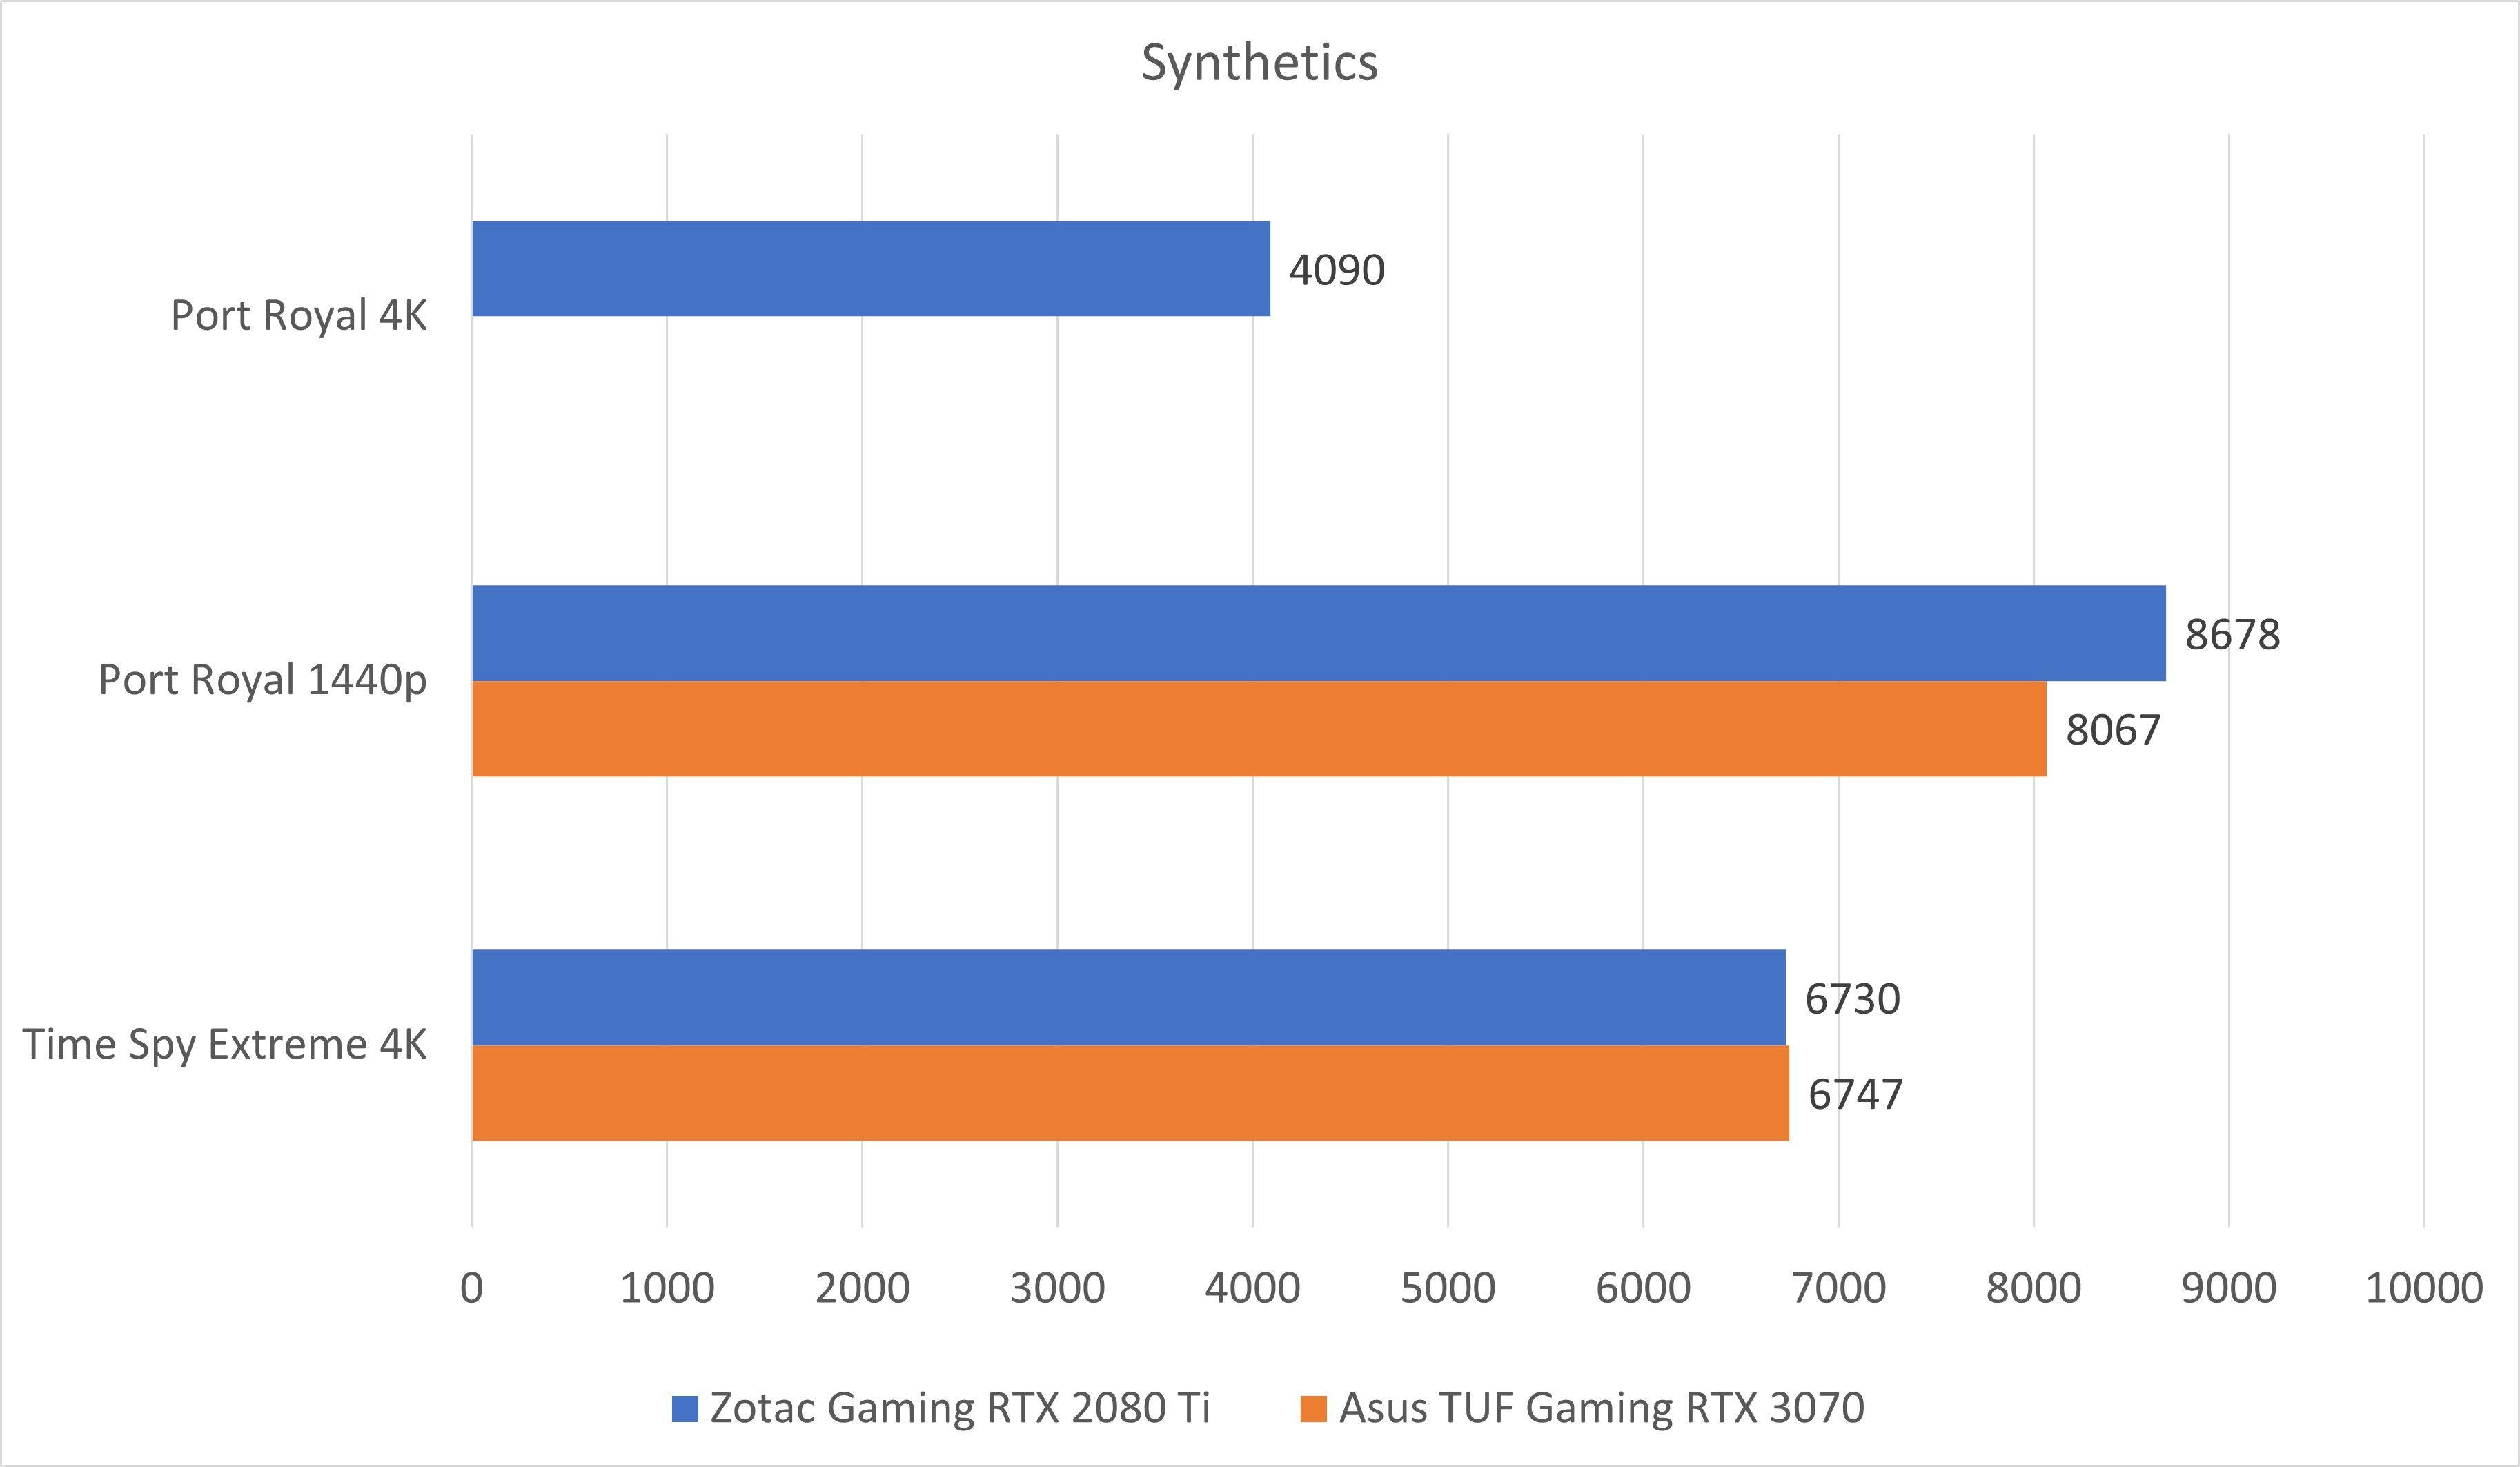 3070 synthetics